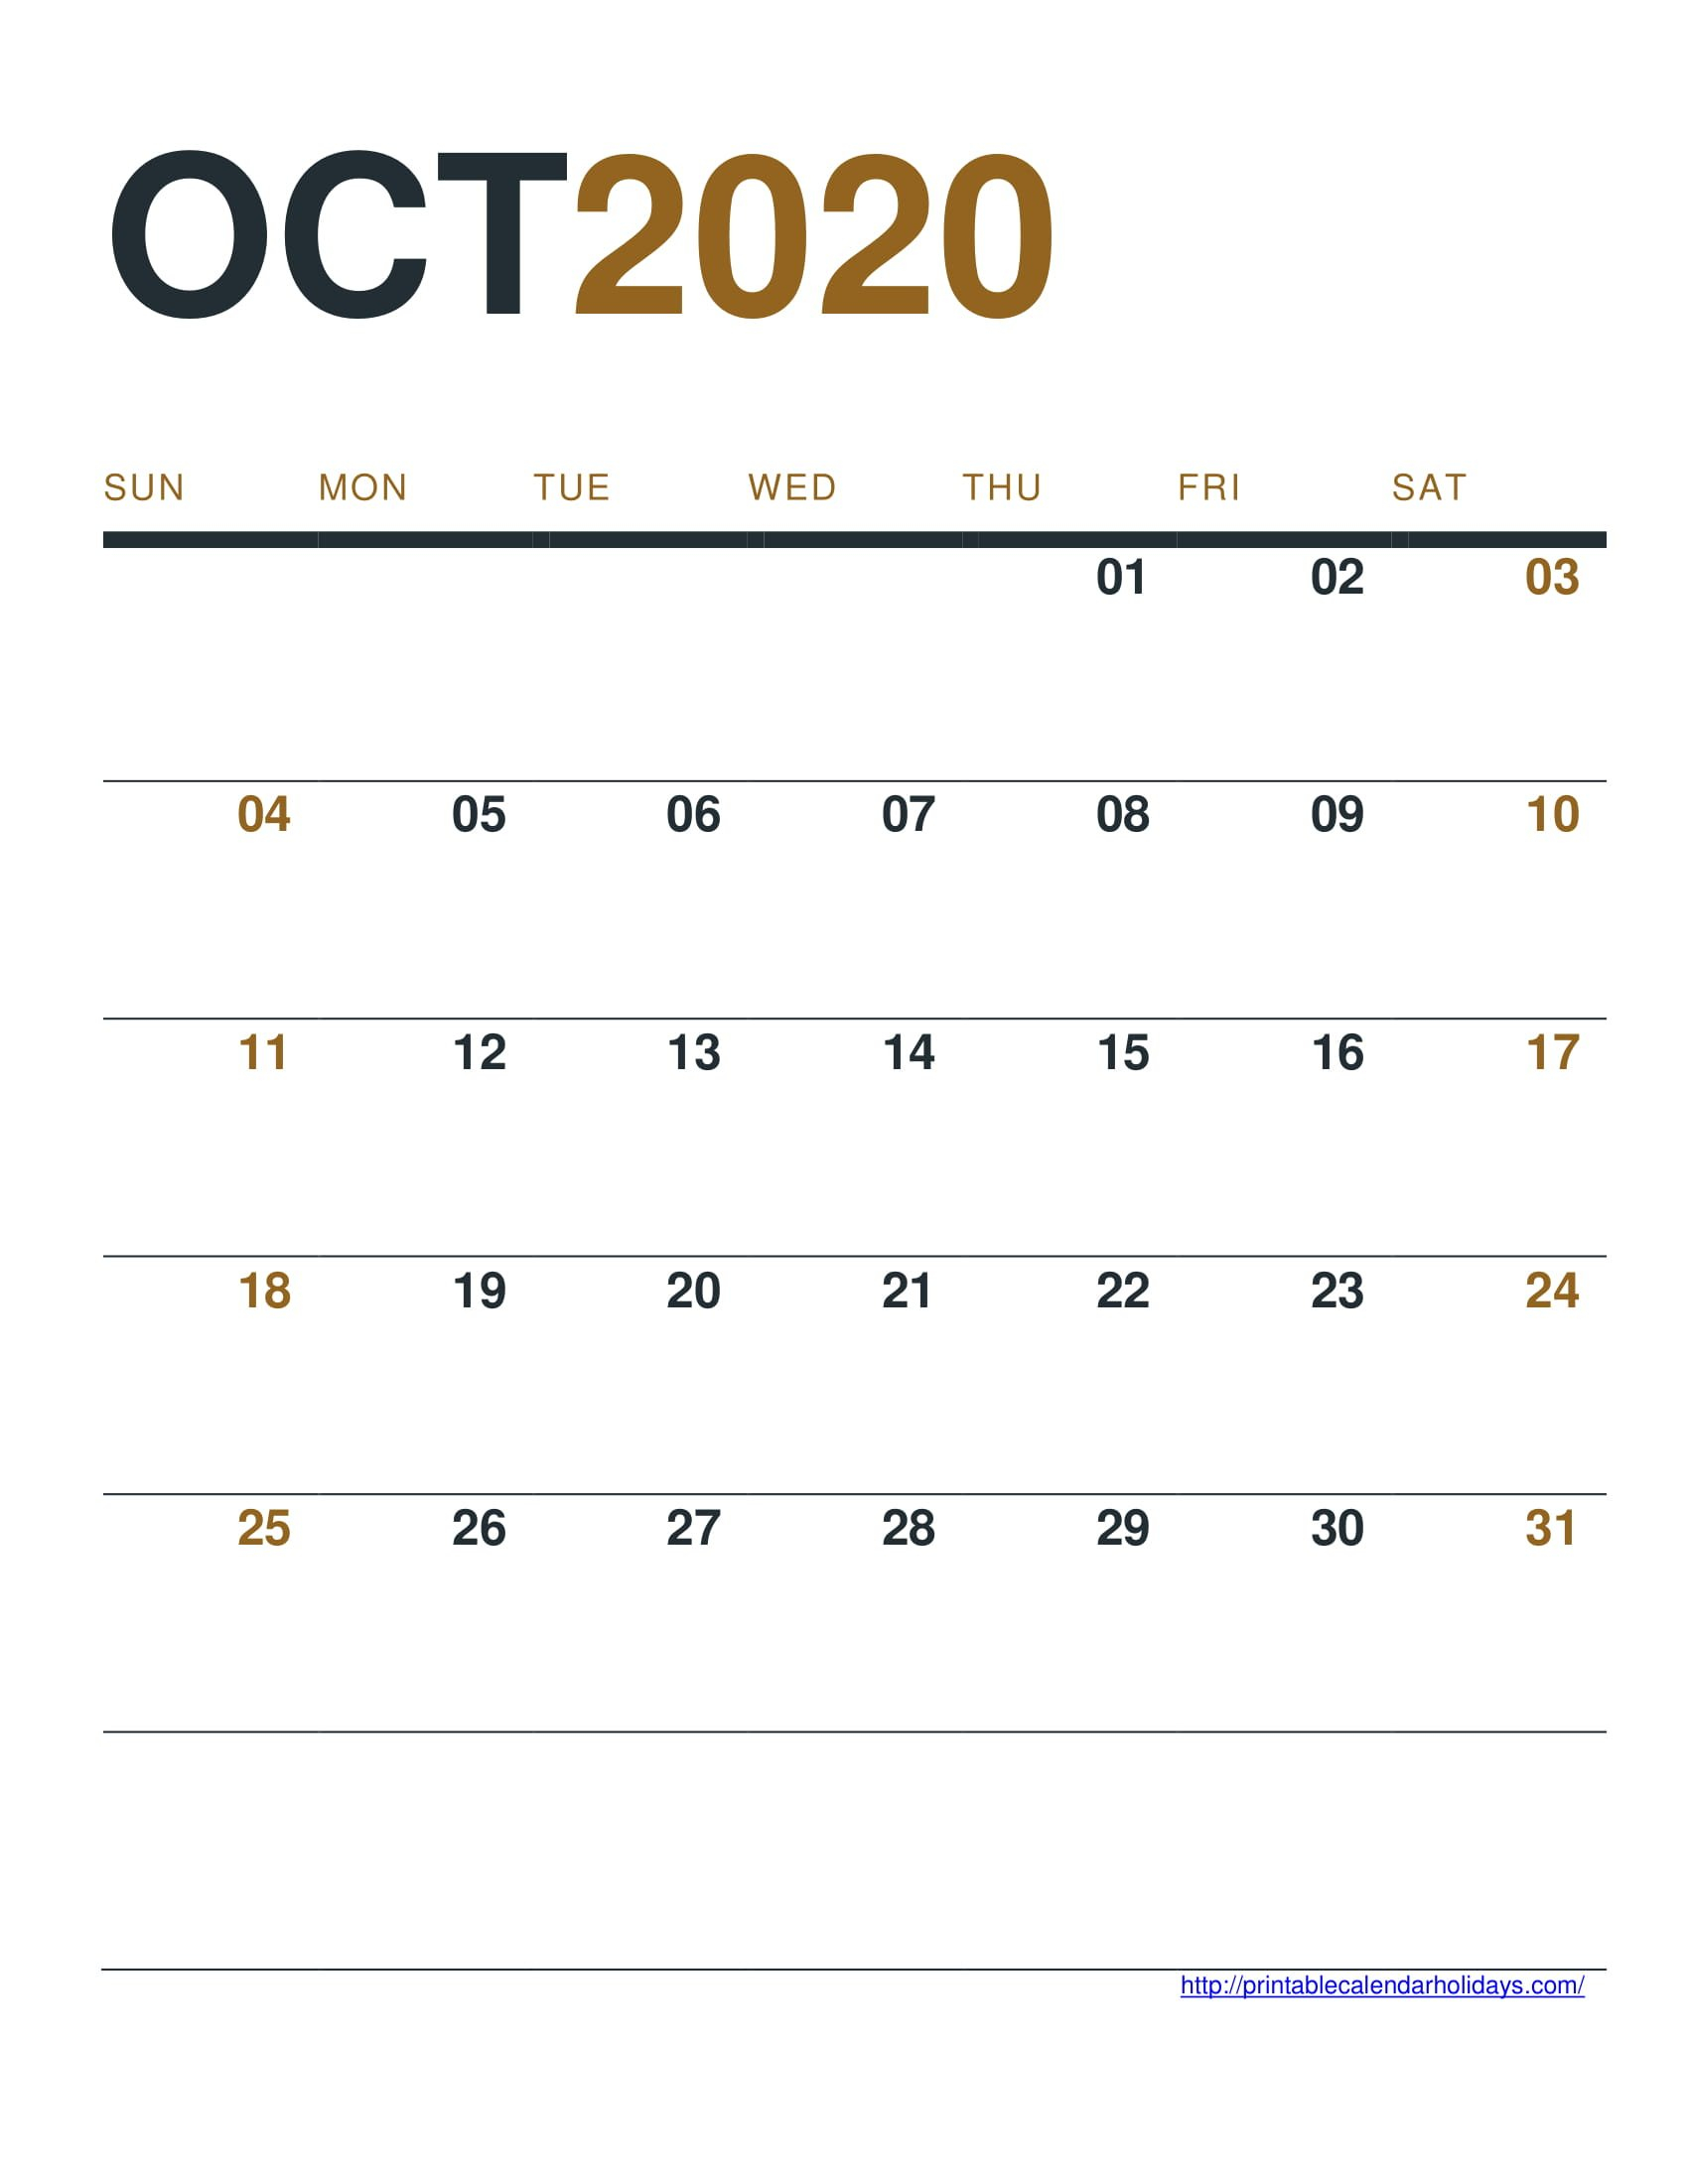 October 2020 Calendar Printable Free - Printable Calendar Free Calendar To Edit And Save